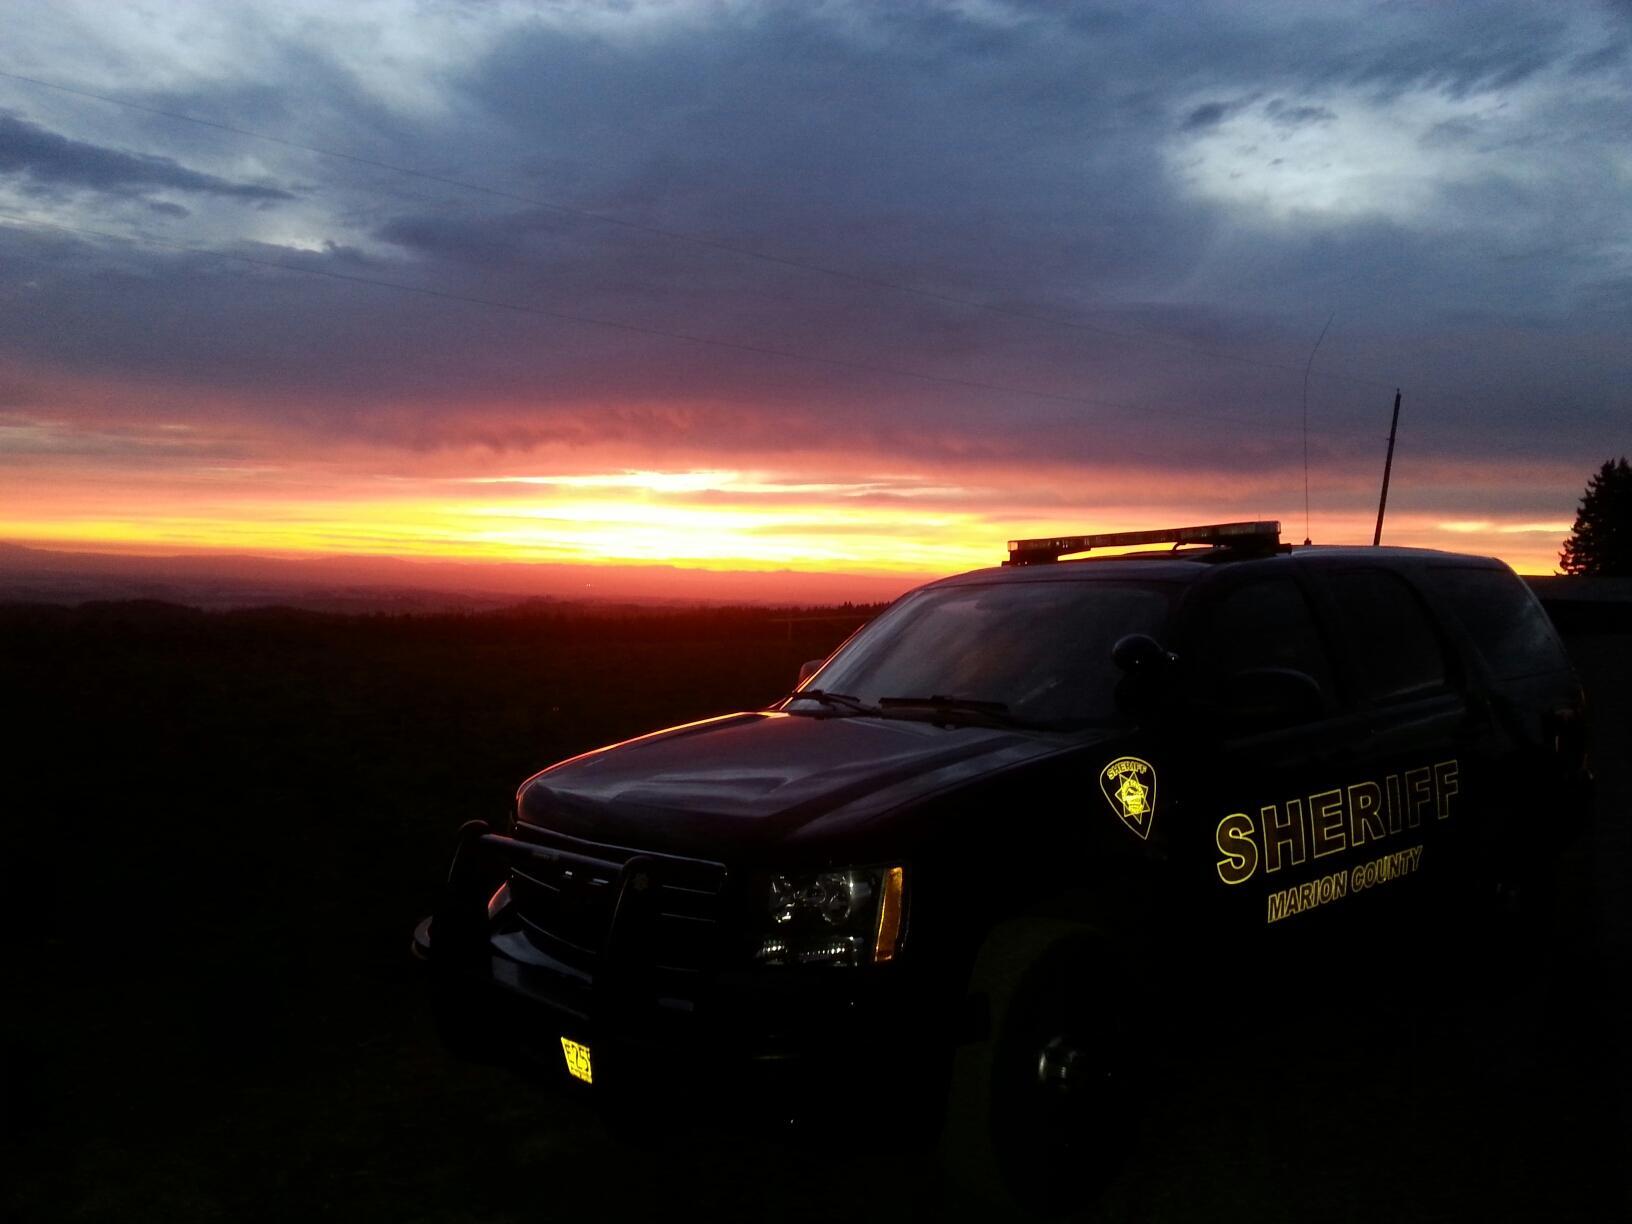 Oregon: Marion County Sheriff Jason Myers sending out extra